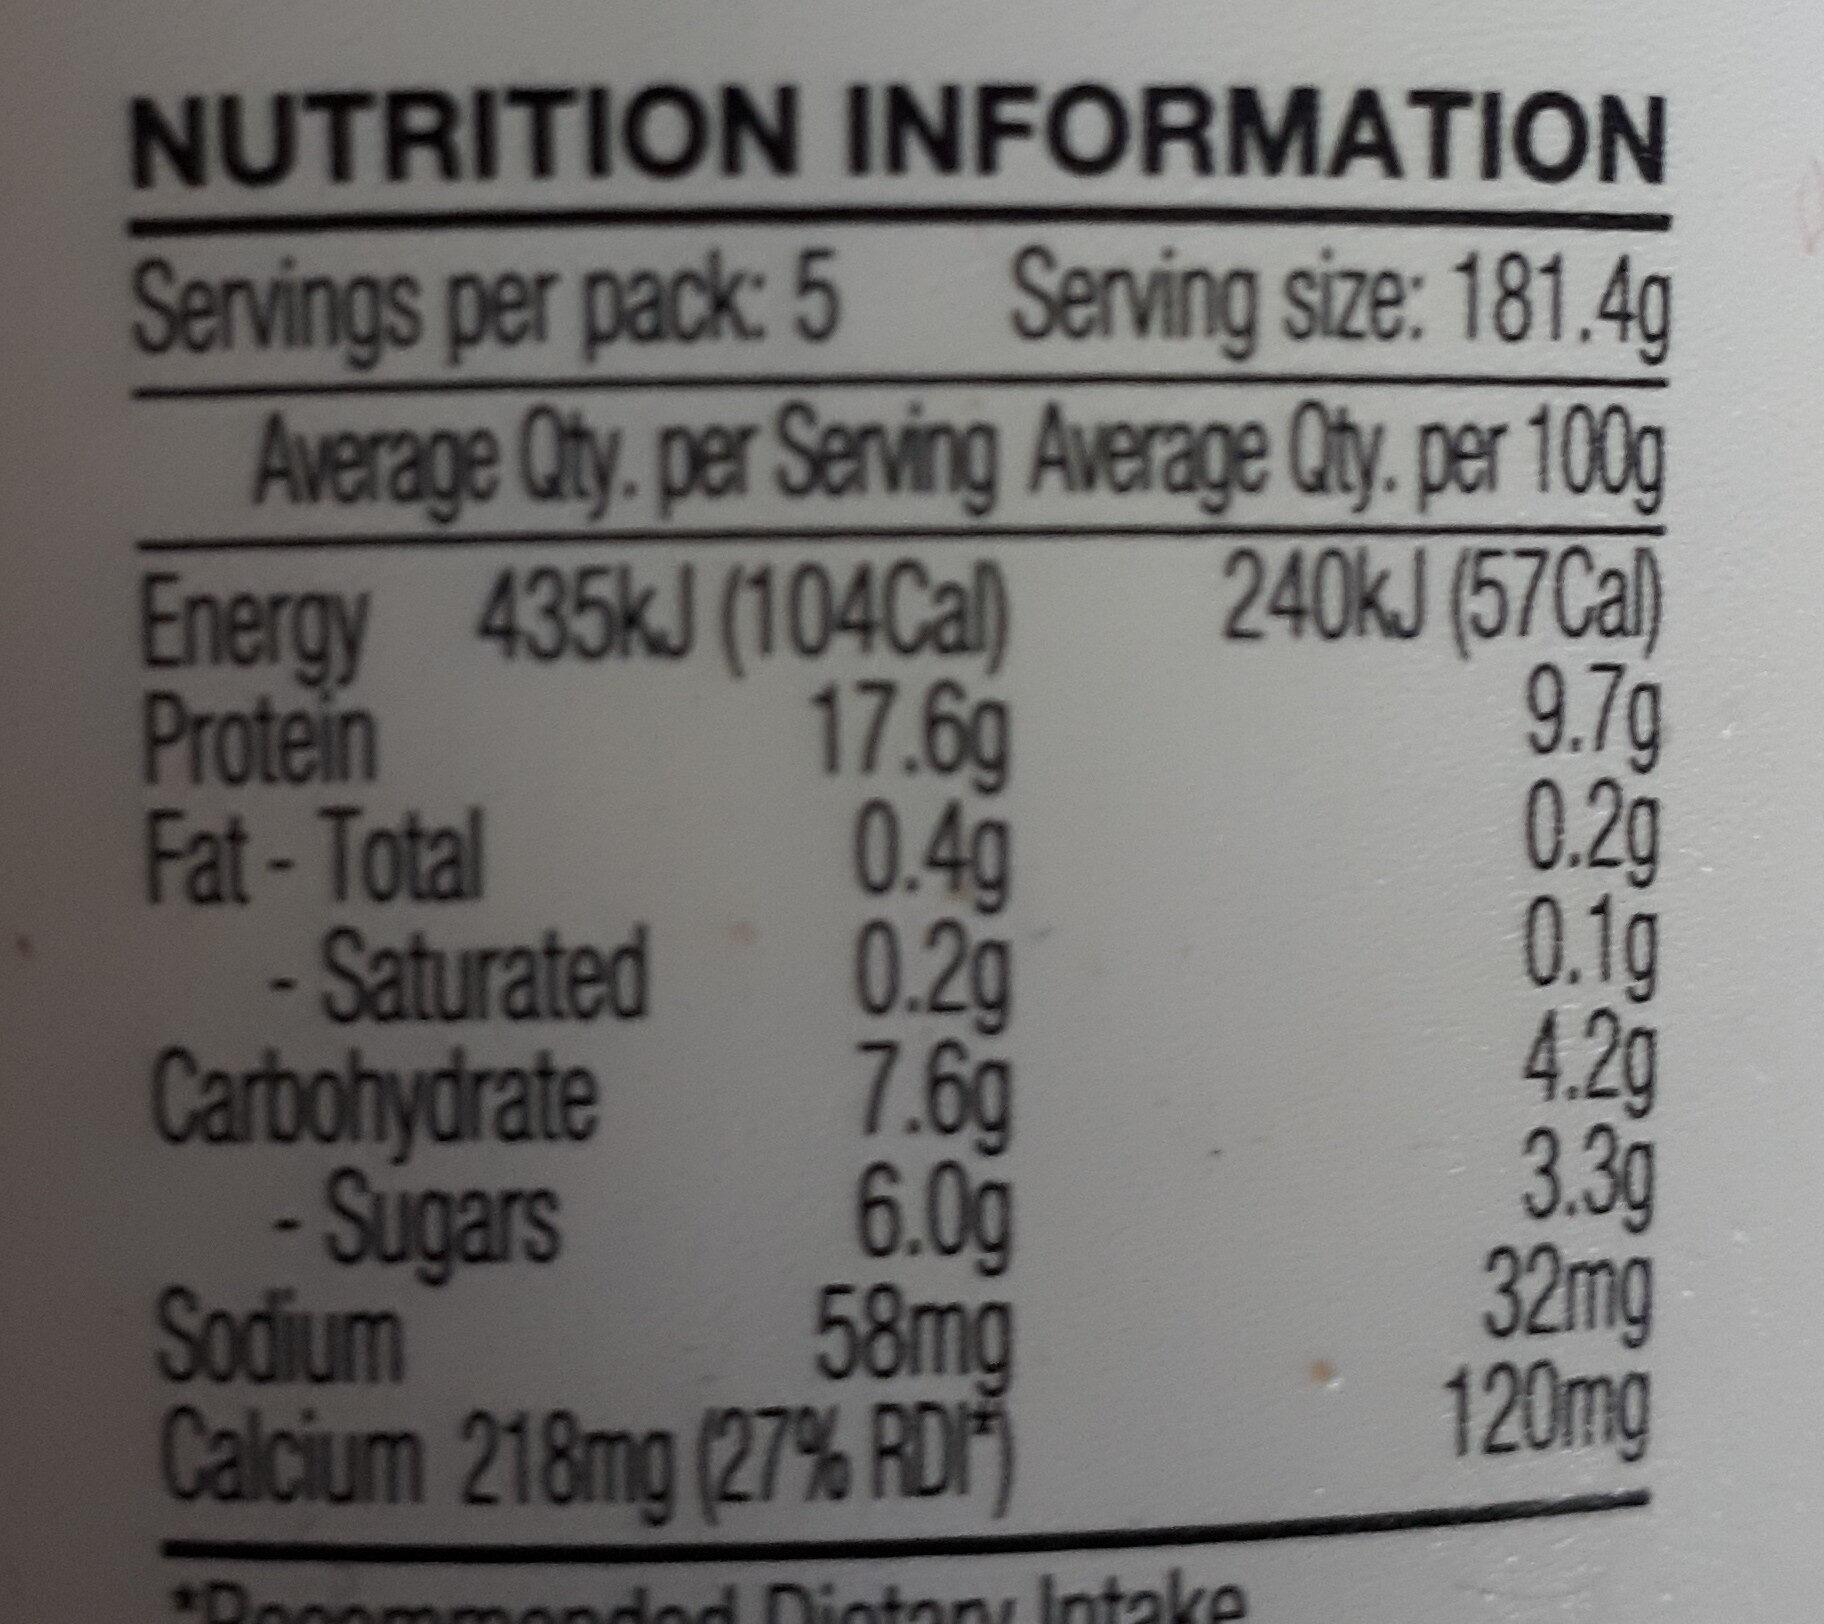 Chobani Plain Greek Yogurt (0.5% fat) - Nutrition facts